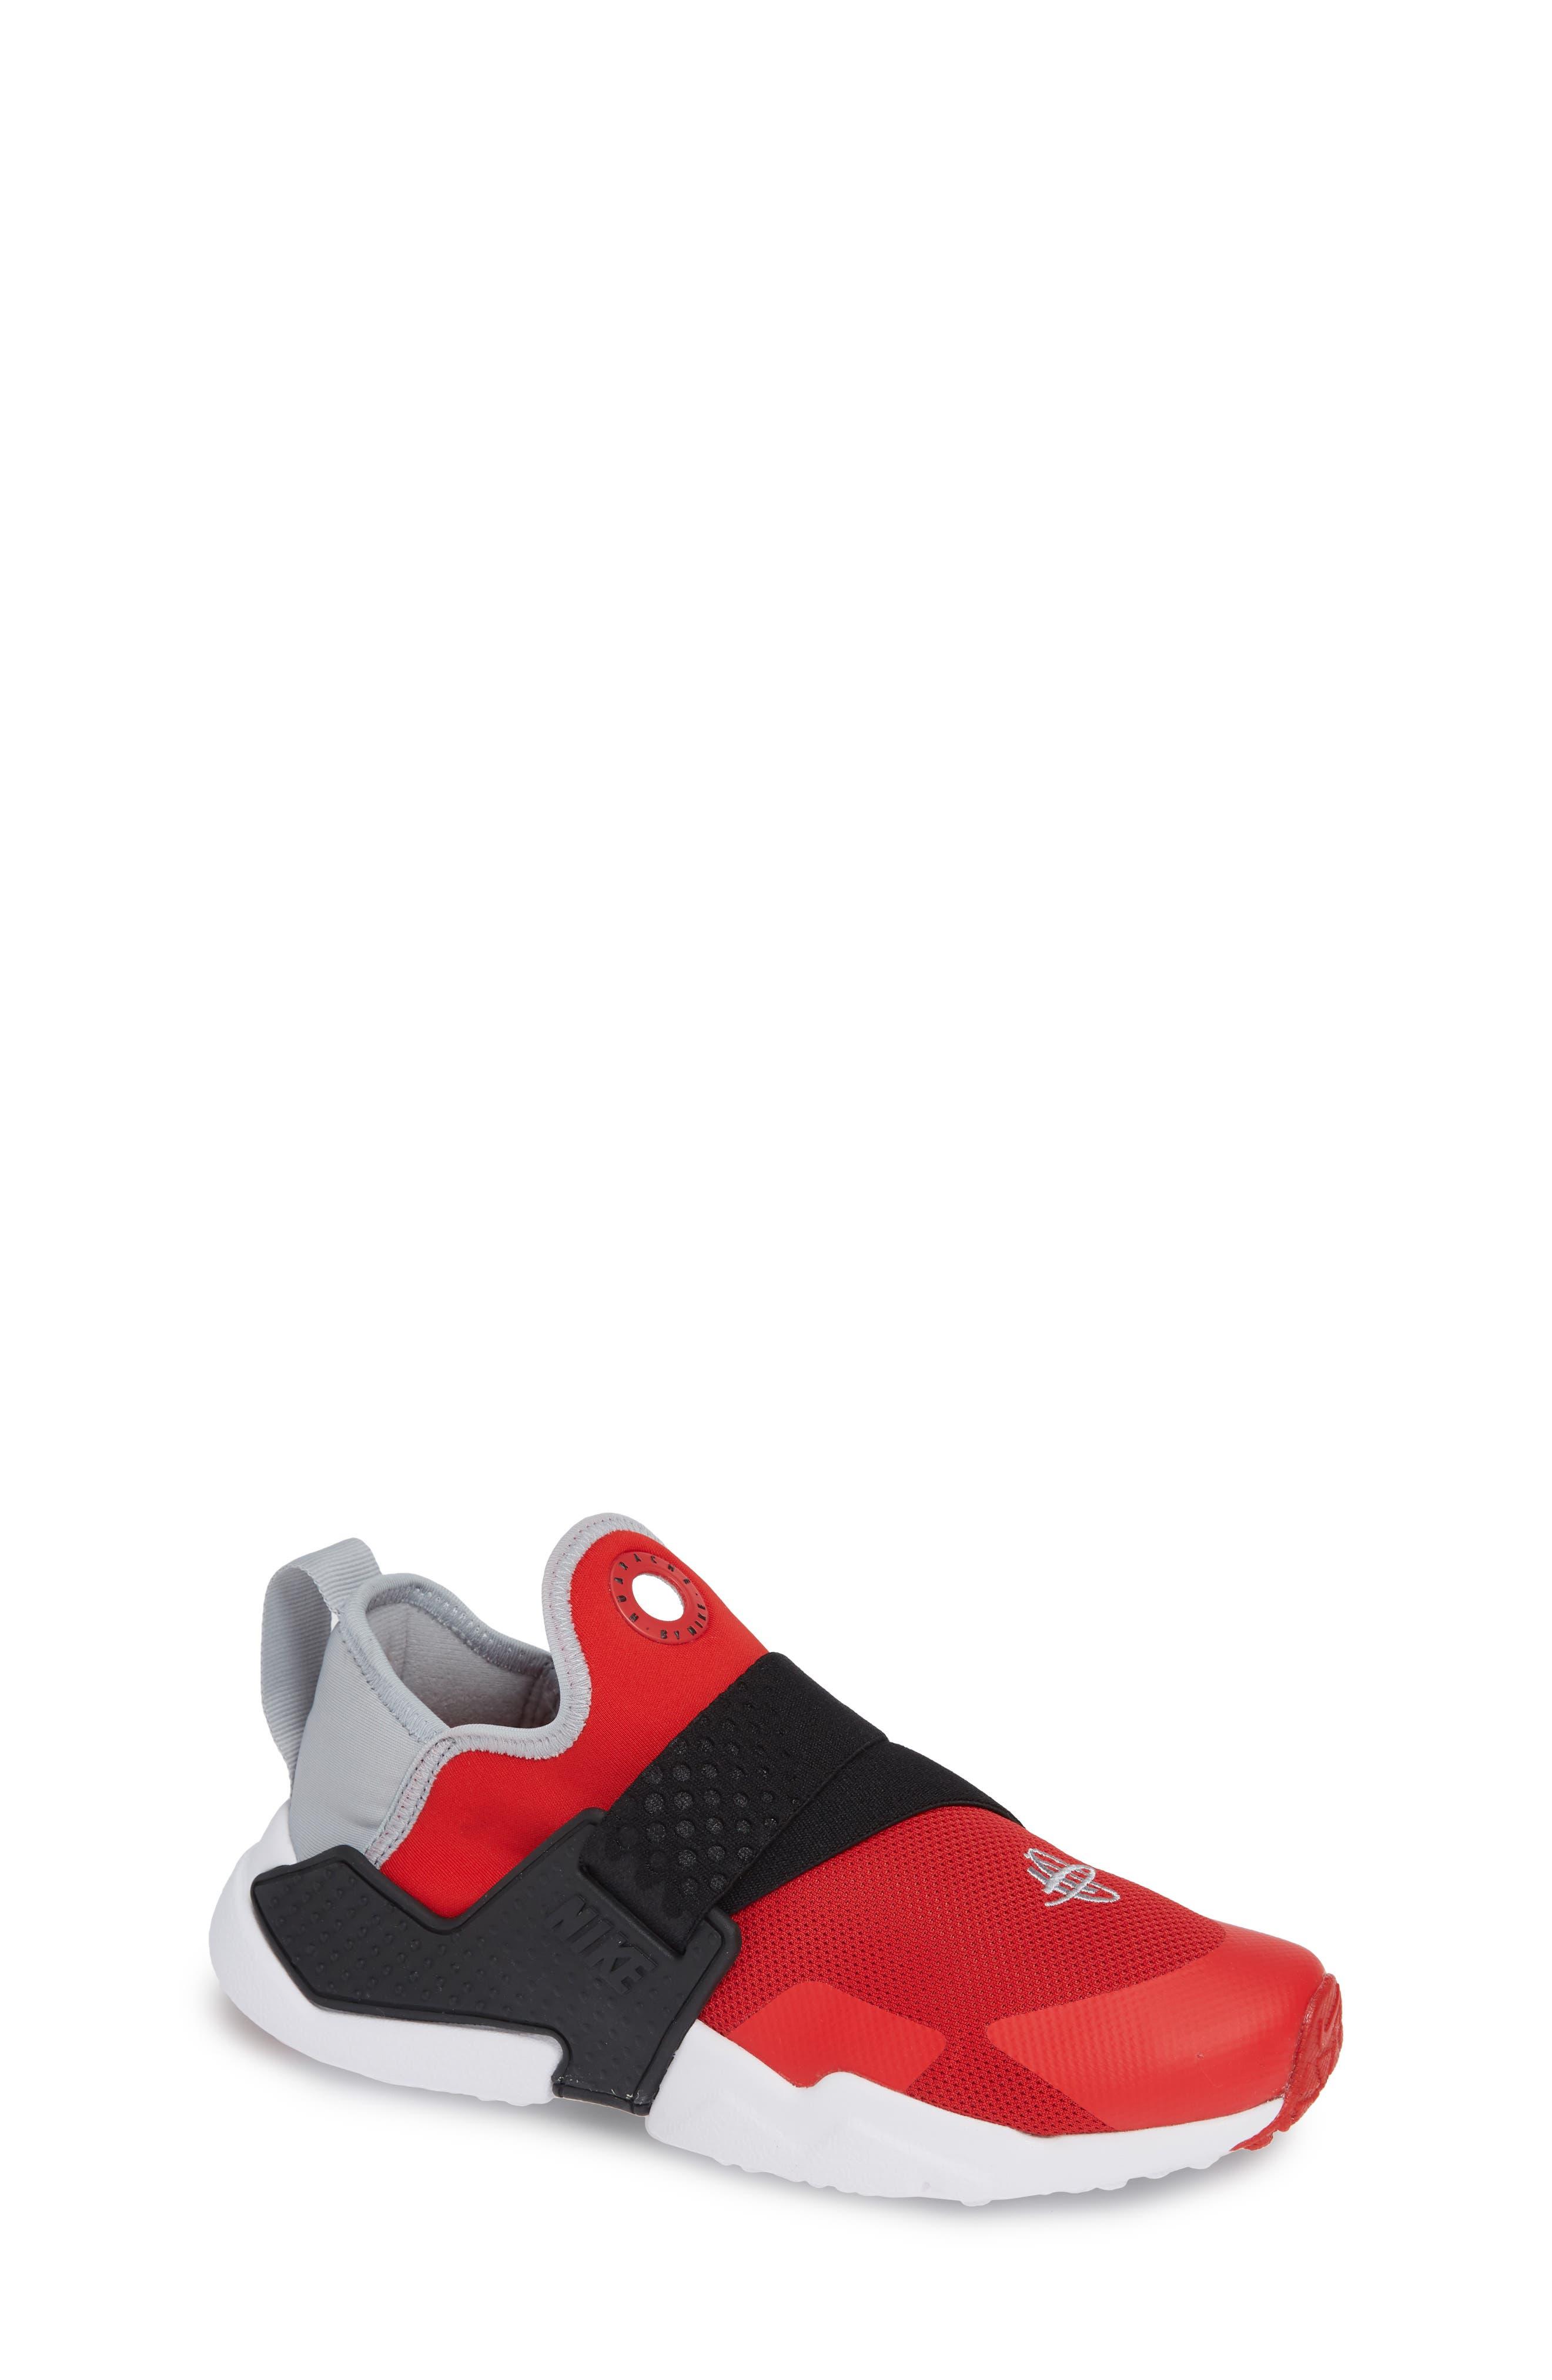 Huarache Extreme Sneaker,                             Main thumbnail 1, color,                             RED/ GREY/ BLACK/ WHITE